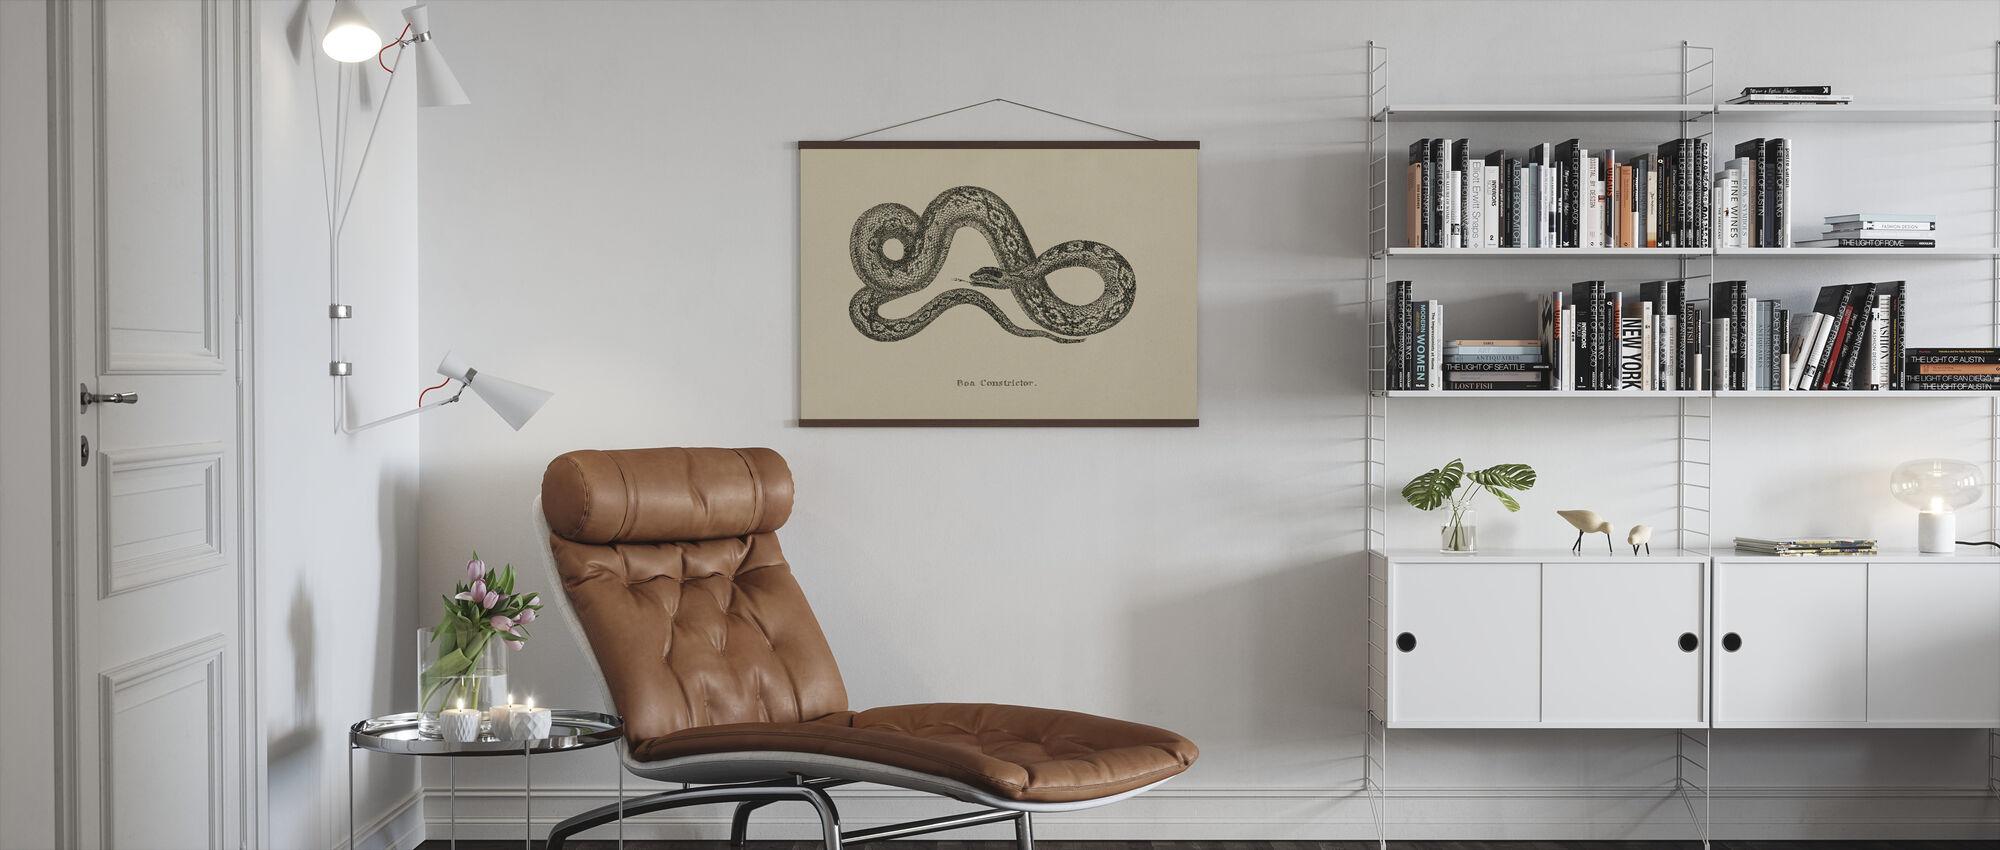 Vintage Boa Constrictor - Poster - Vardagsrum